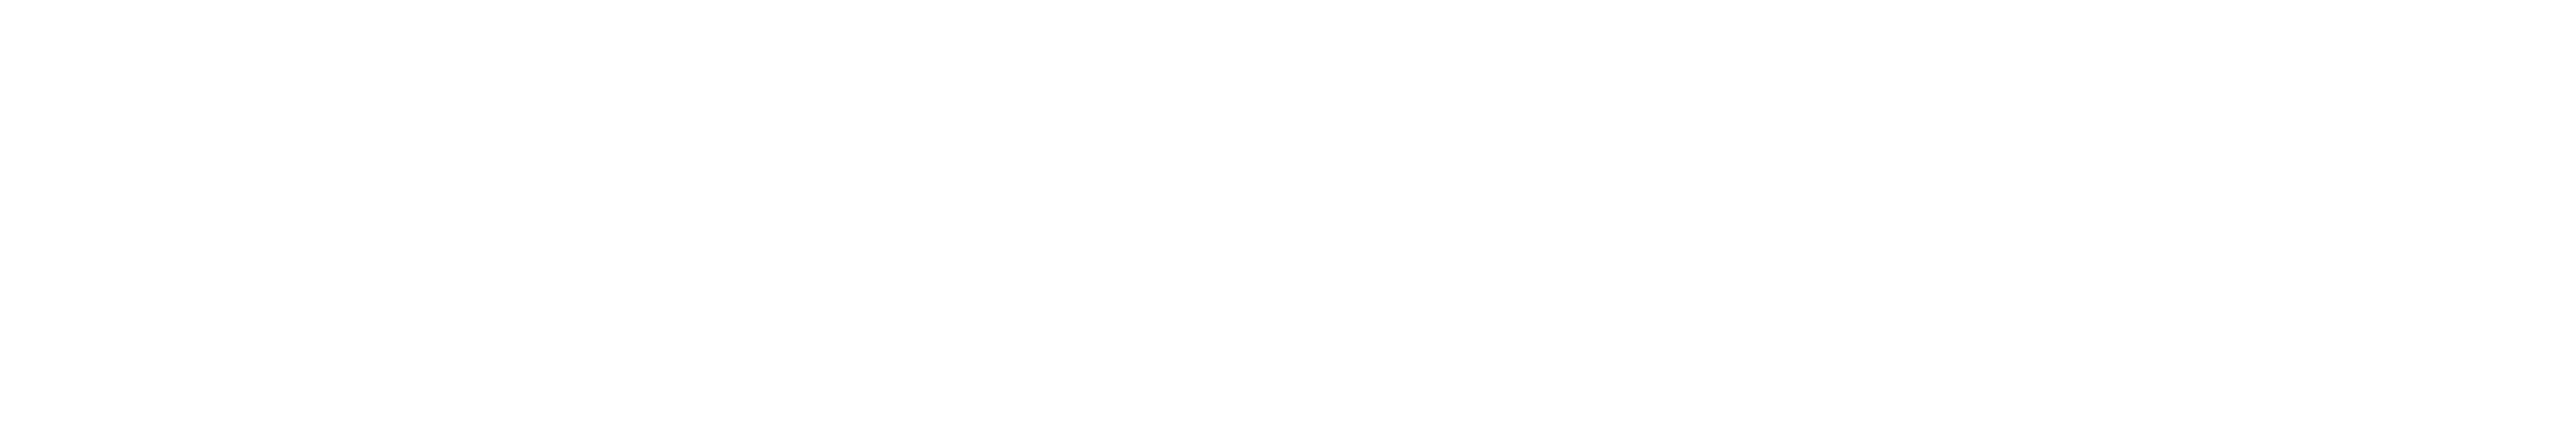 Almas Group Logistics